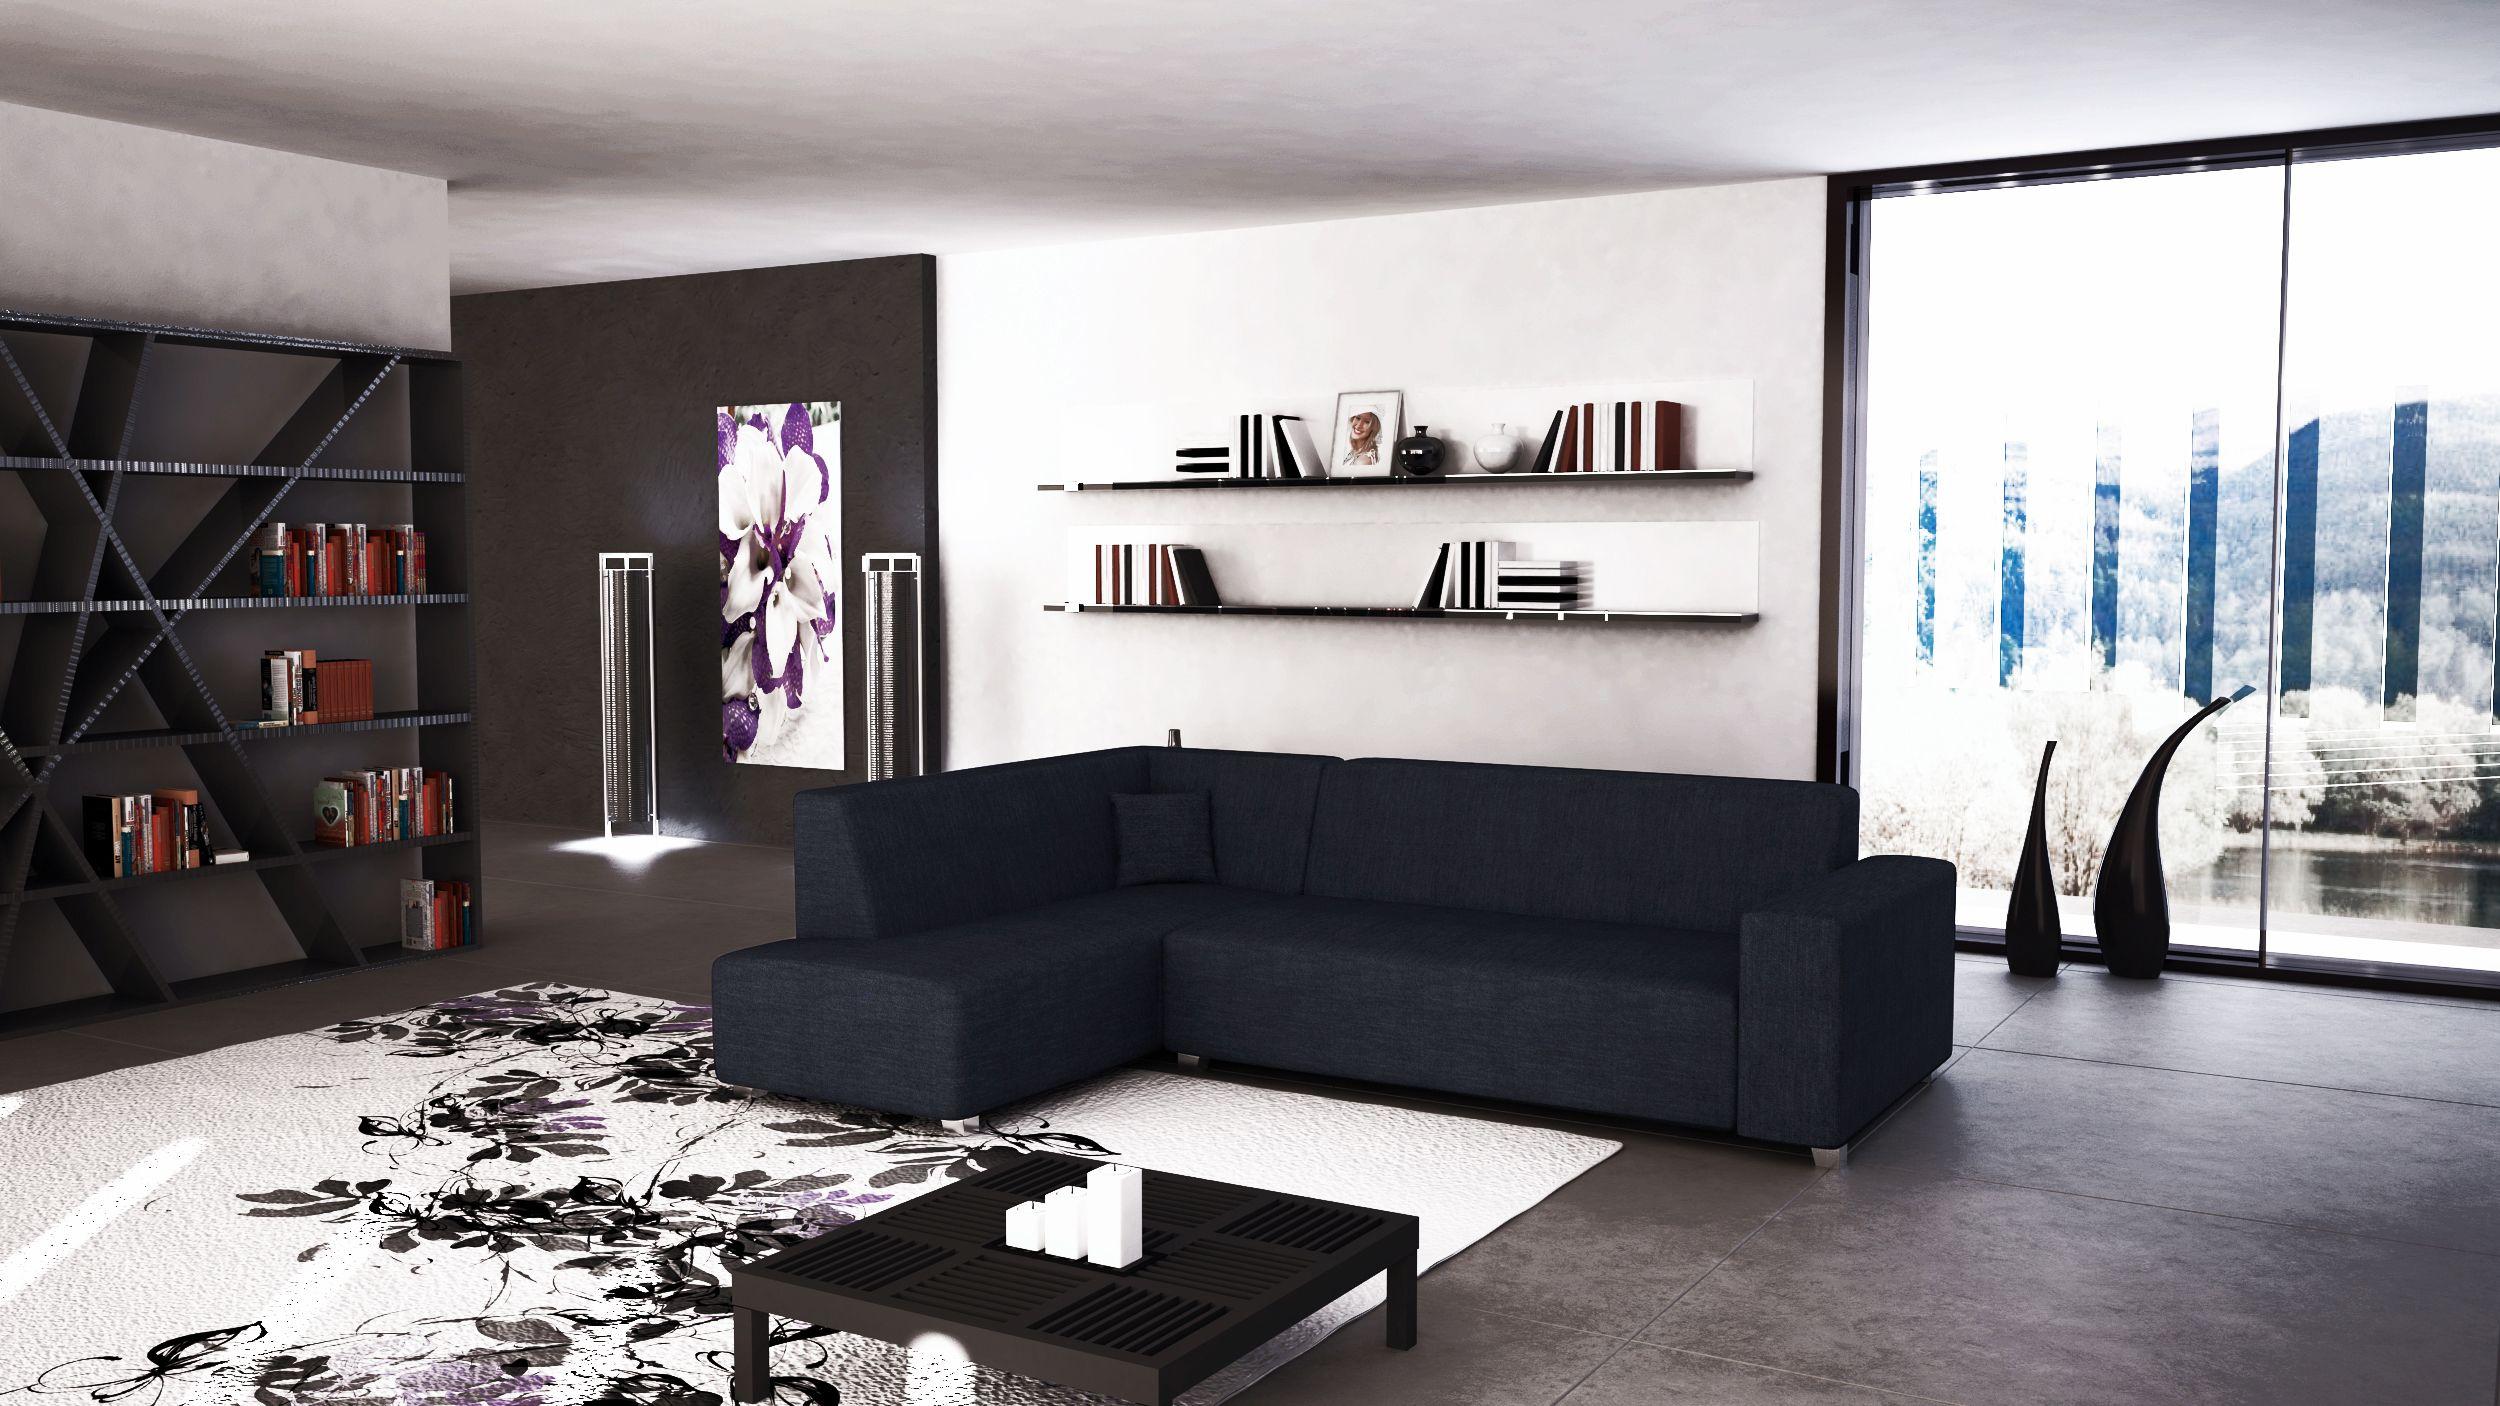 Sof cama tina de l nea minimalista tapizado en tela de color negro con chaise longue a la - Sofa cama minimalista ...